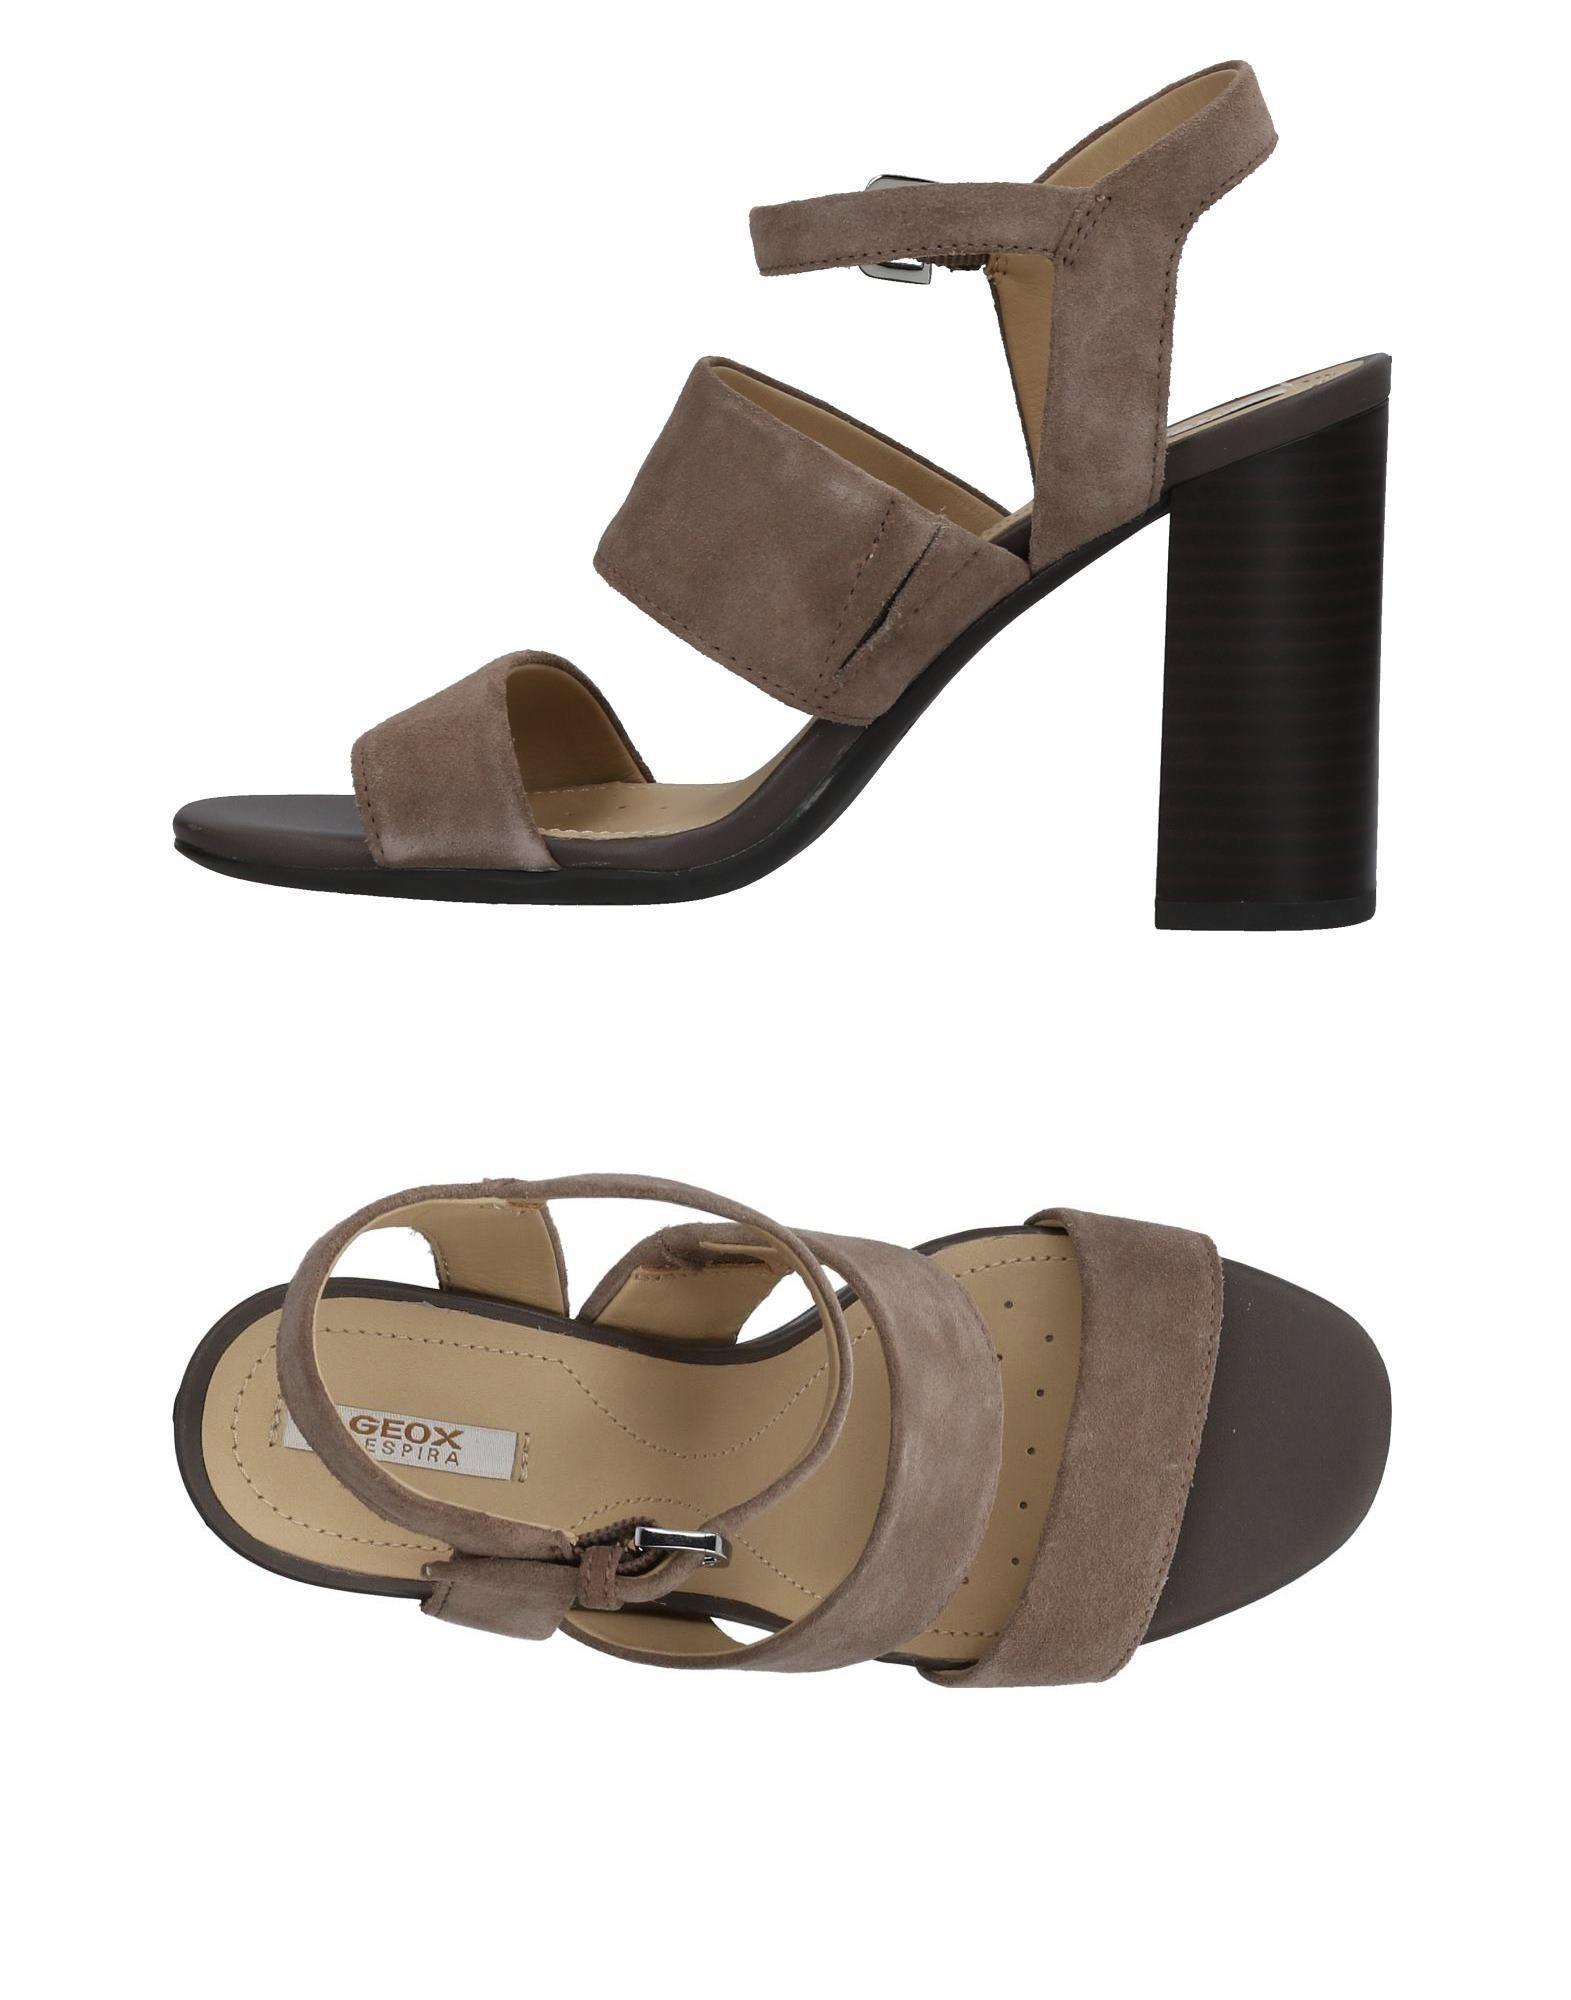 Geox Sandalen Damen  11391711FP Gute Qualität beliebte Schuhe